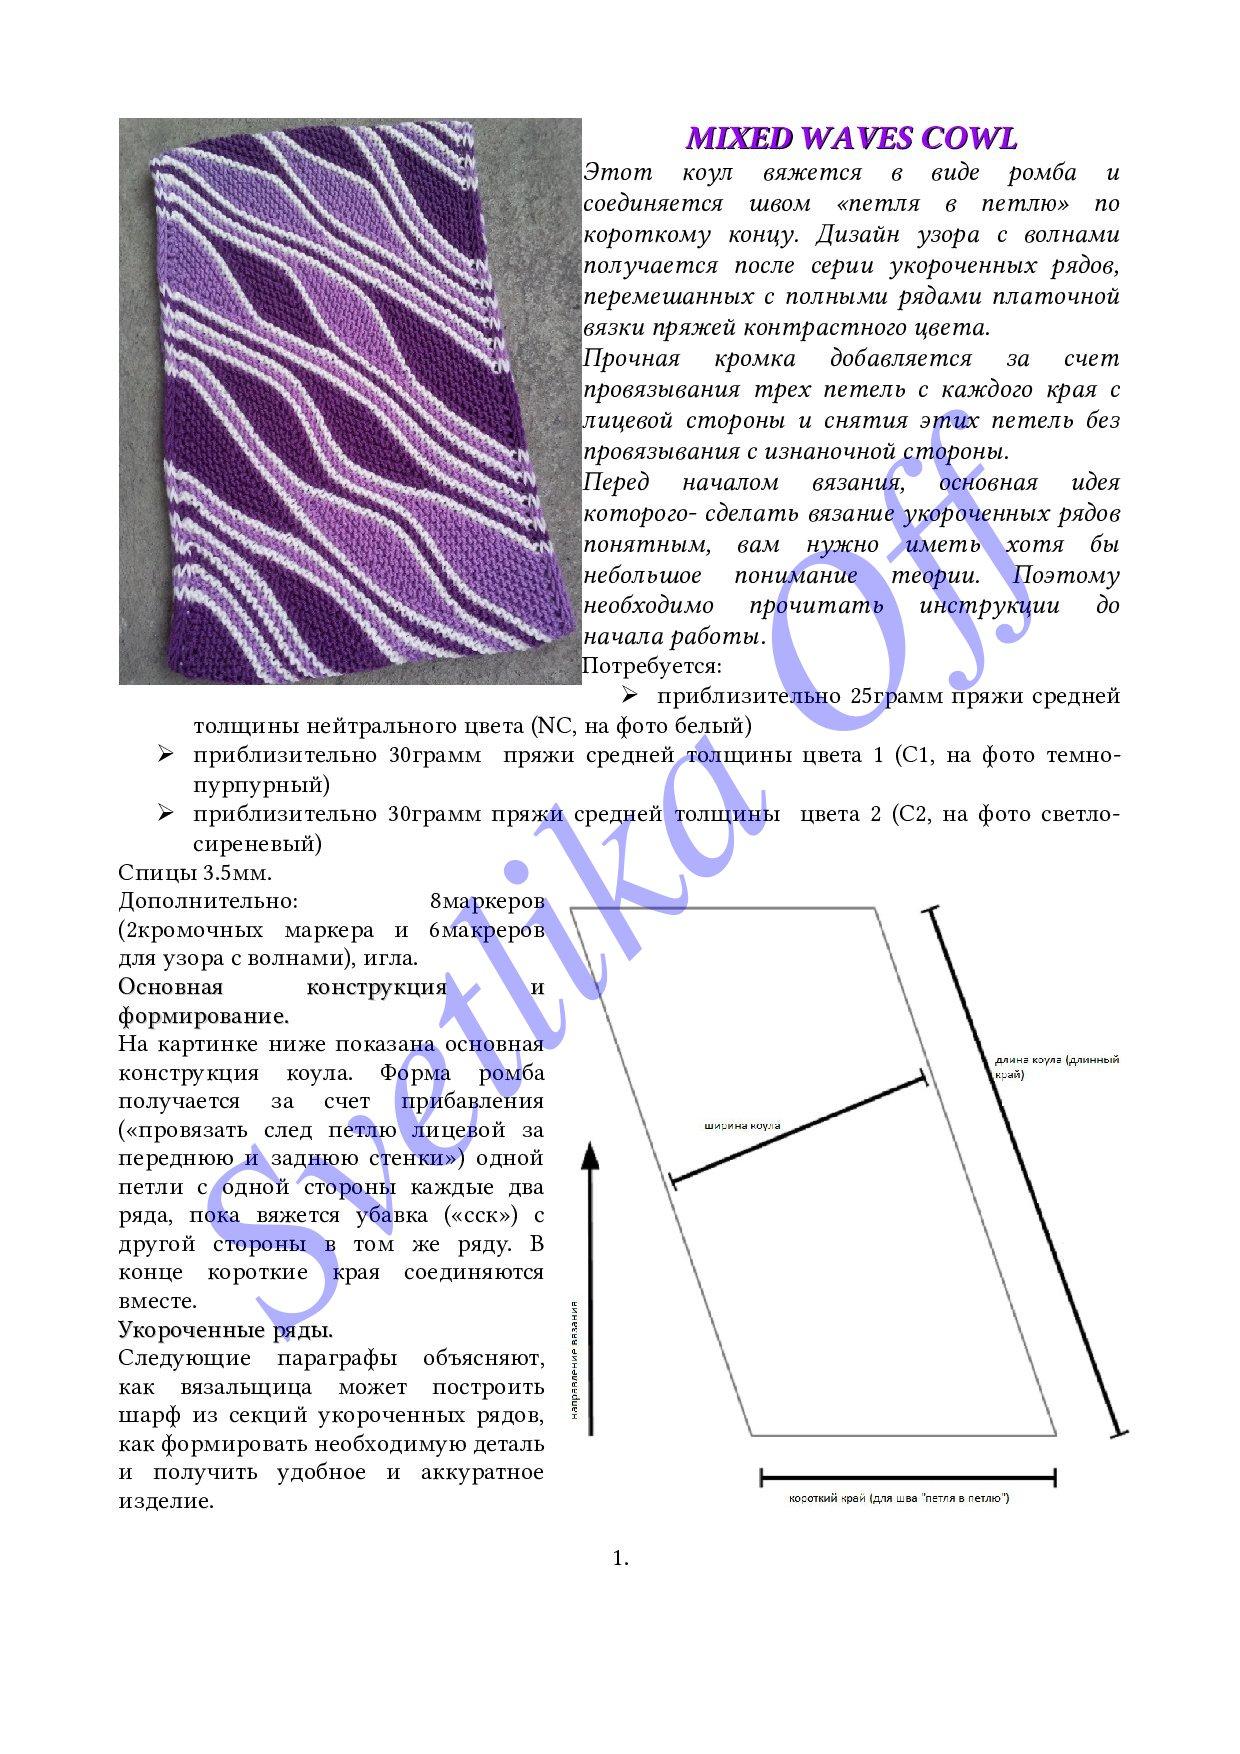 https://img-fotki.yandex.ru/get/167717/125862467.93/0_1abcb6_5f0c45aa_orig